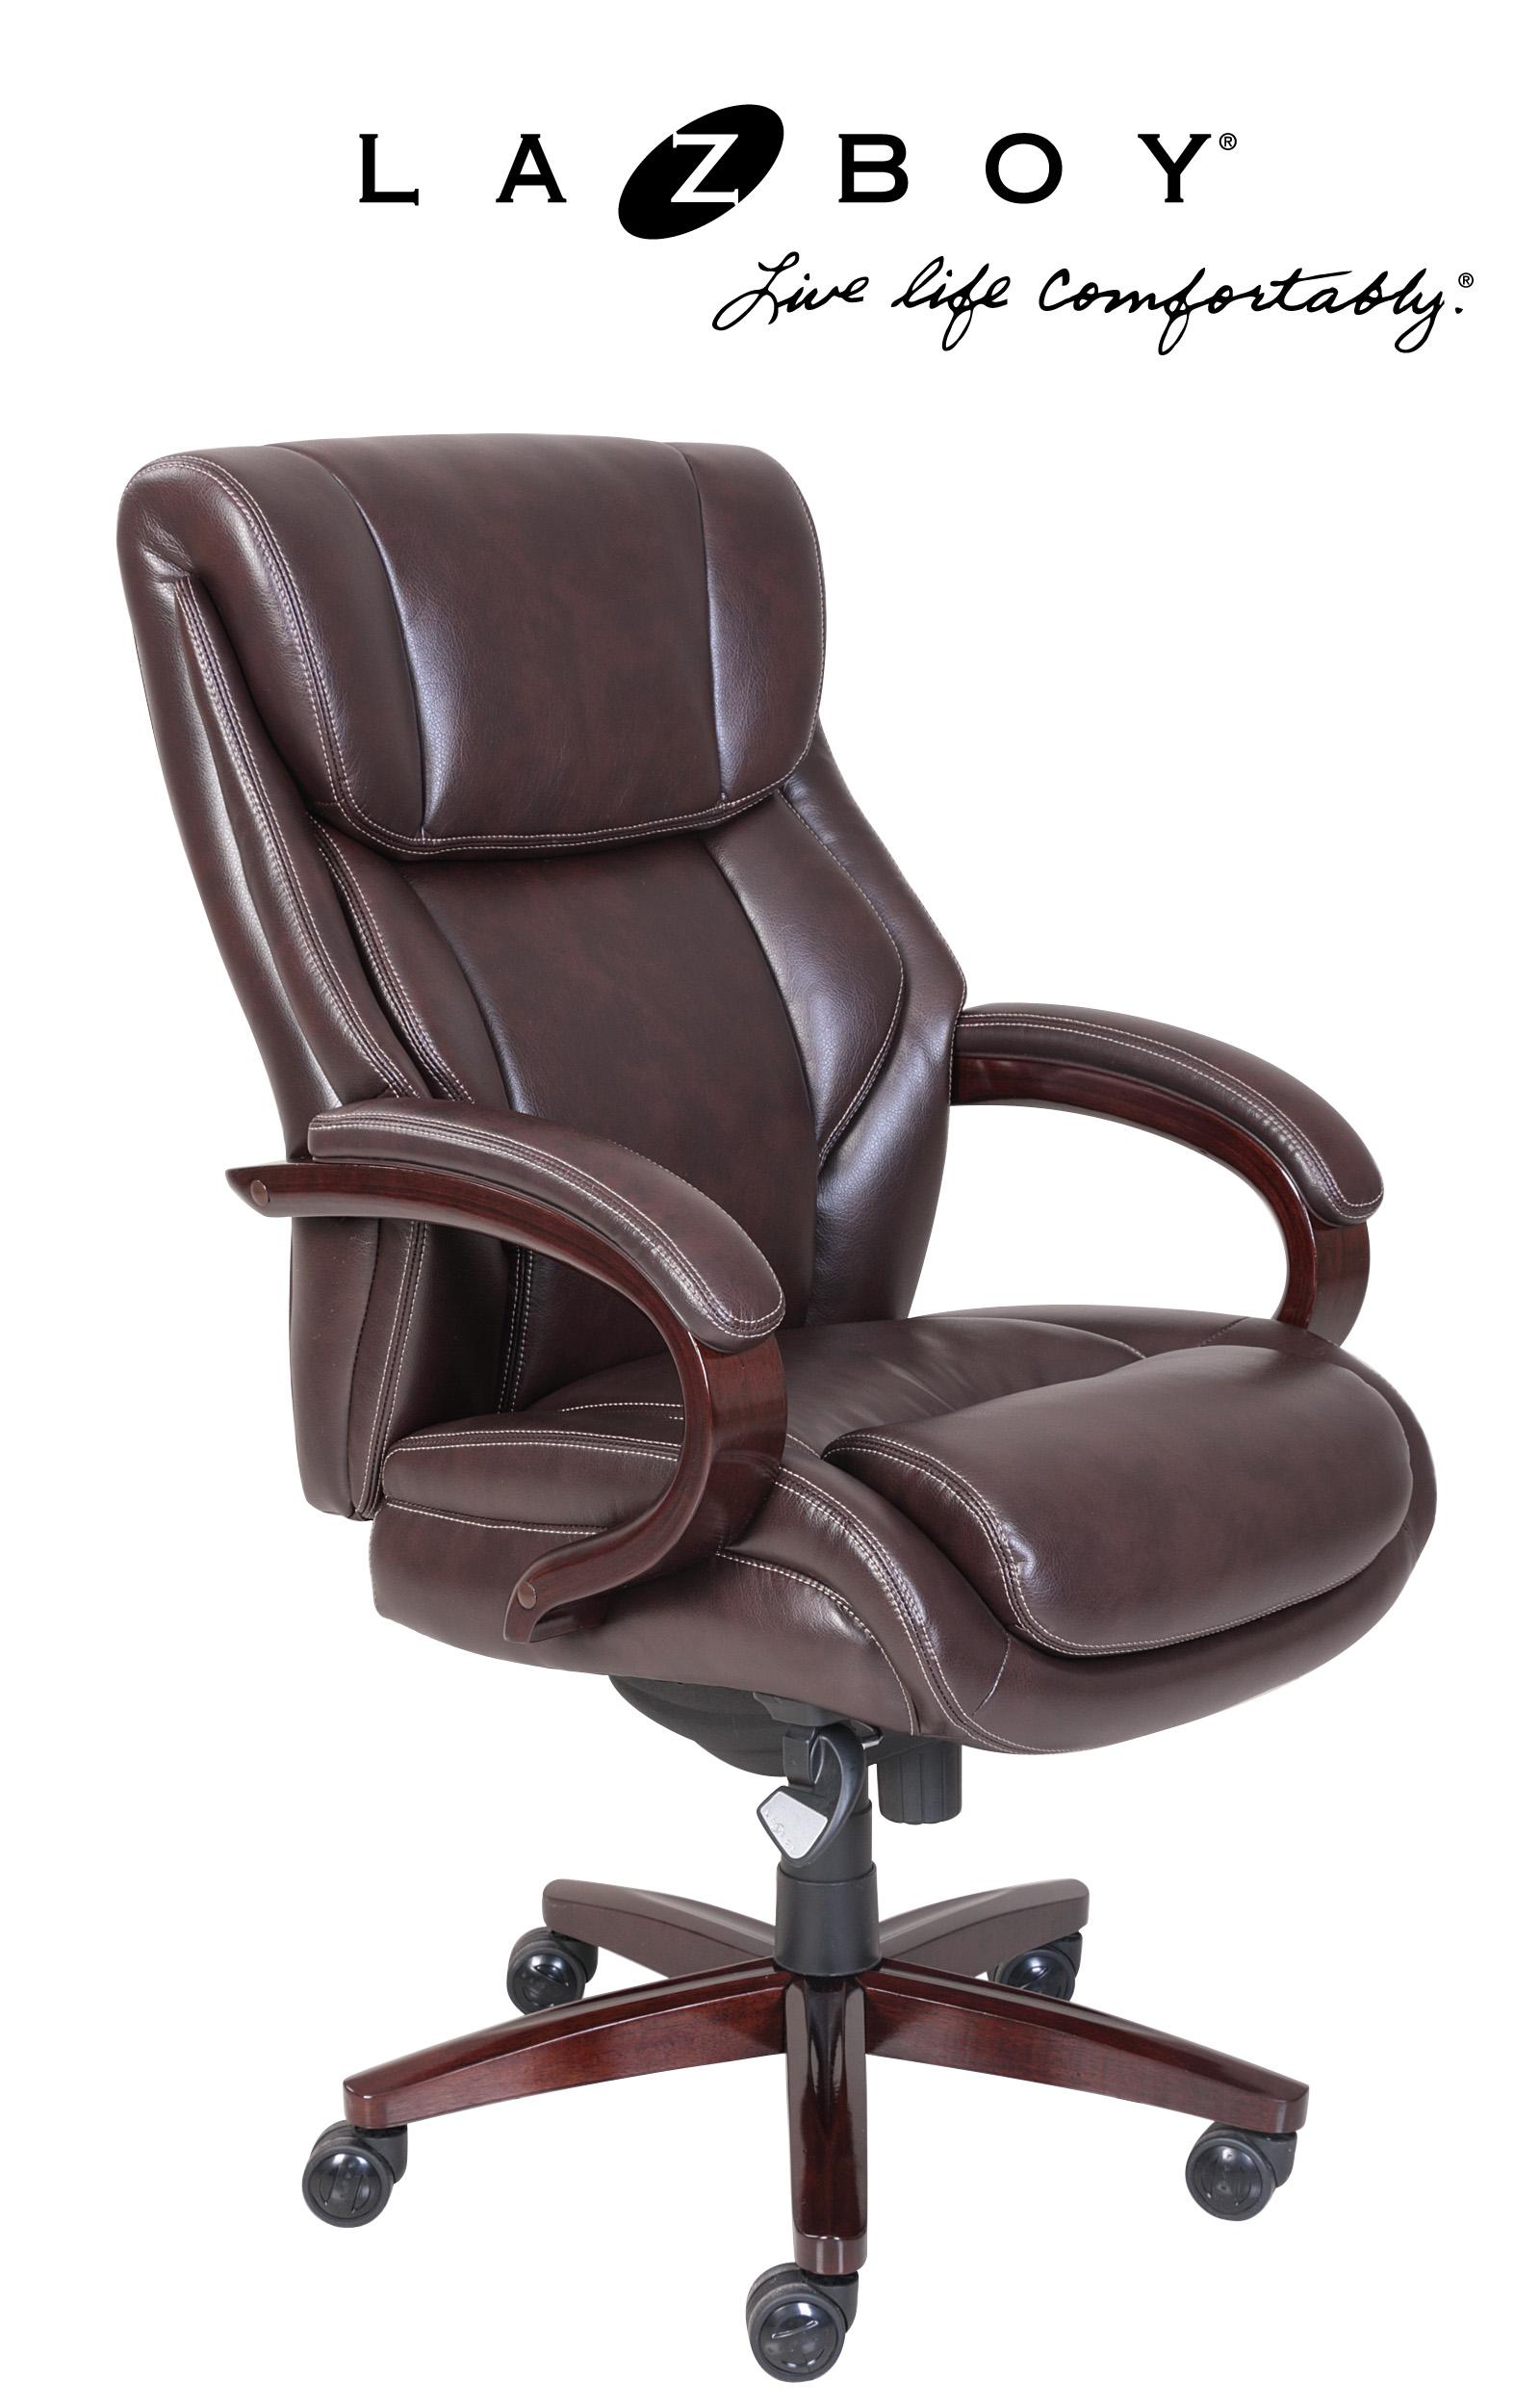 la z boy office chair replacement parts makeup artist folding bellamy comfort core traditions executive